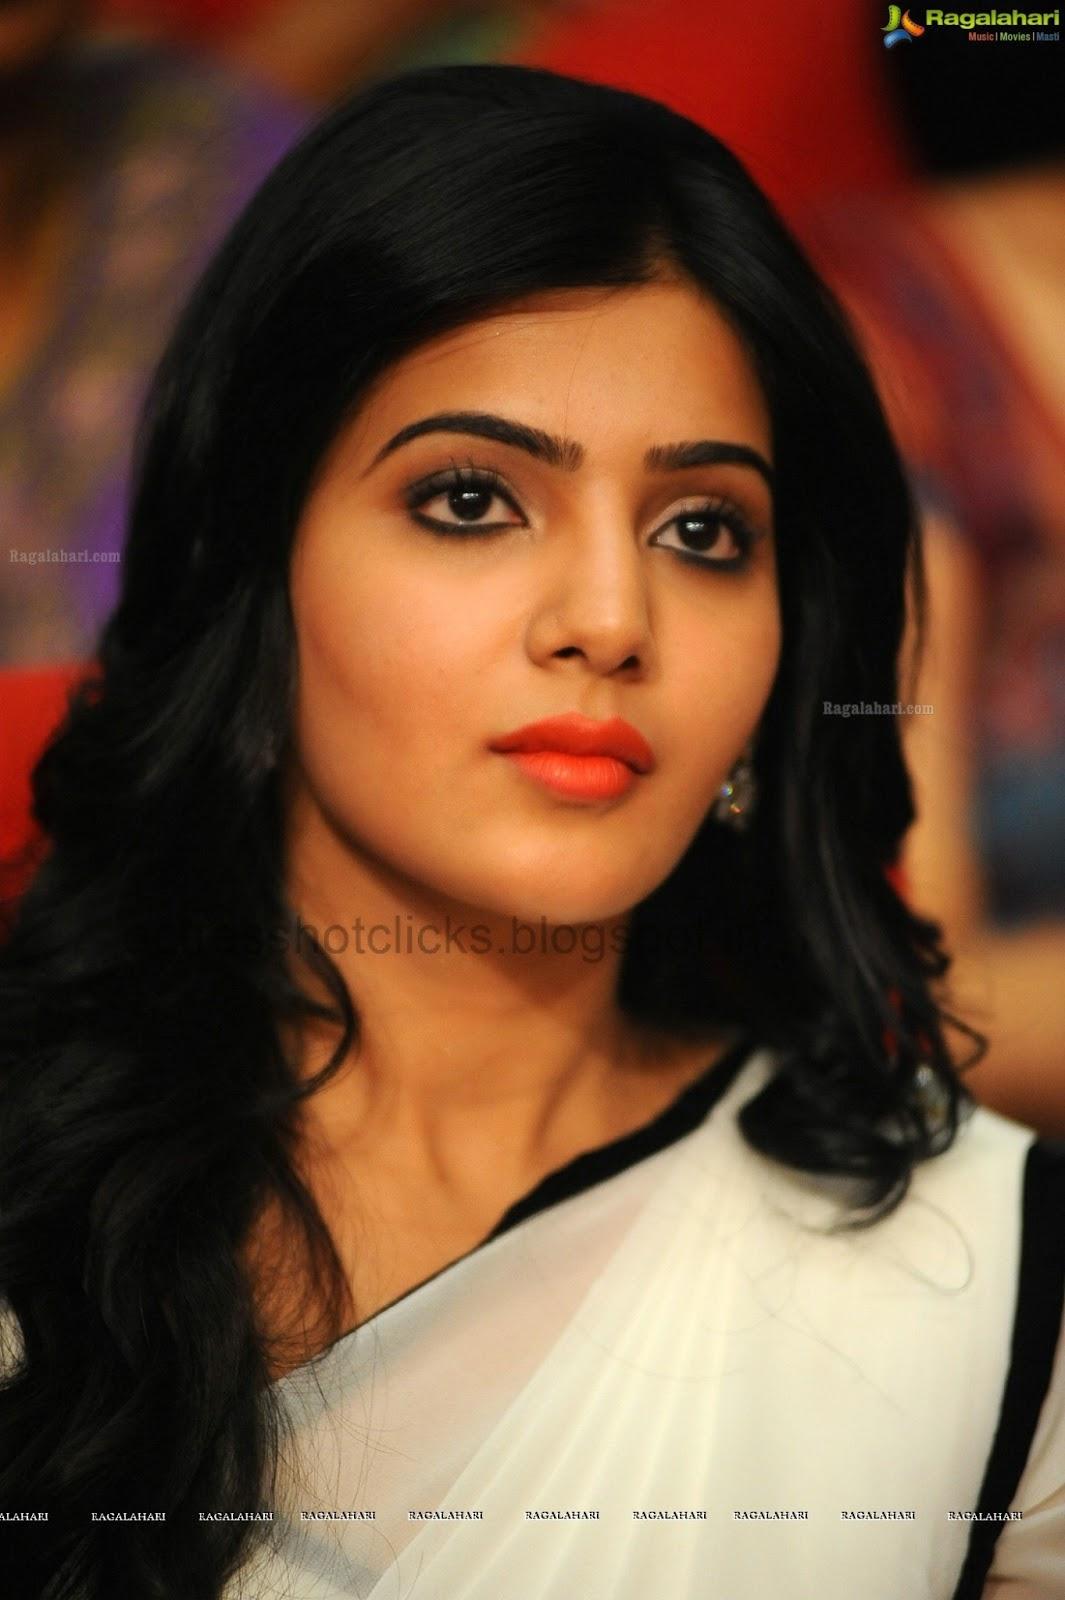 Samantha In Saree: Actresshotclicks: Samantha At Svsc Triple Platinum Disc